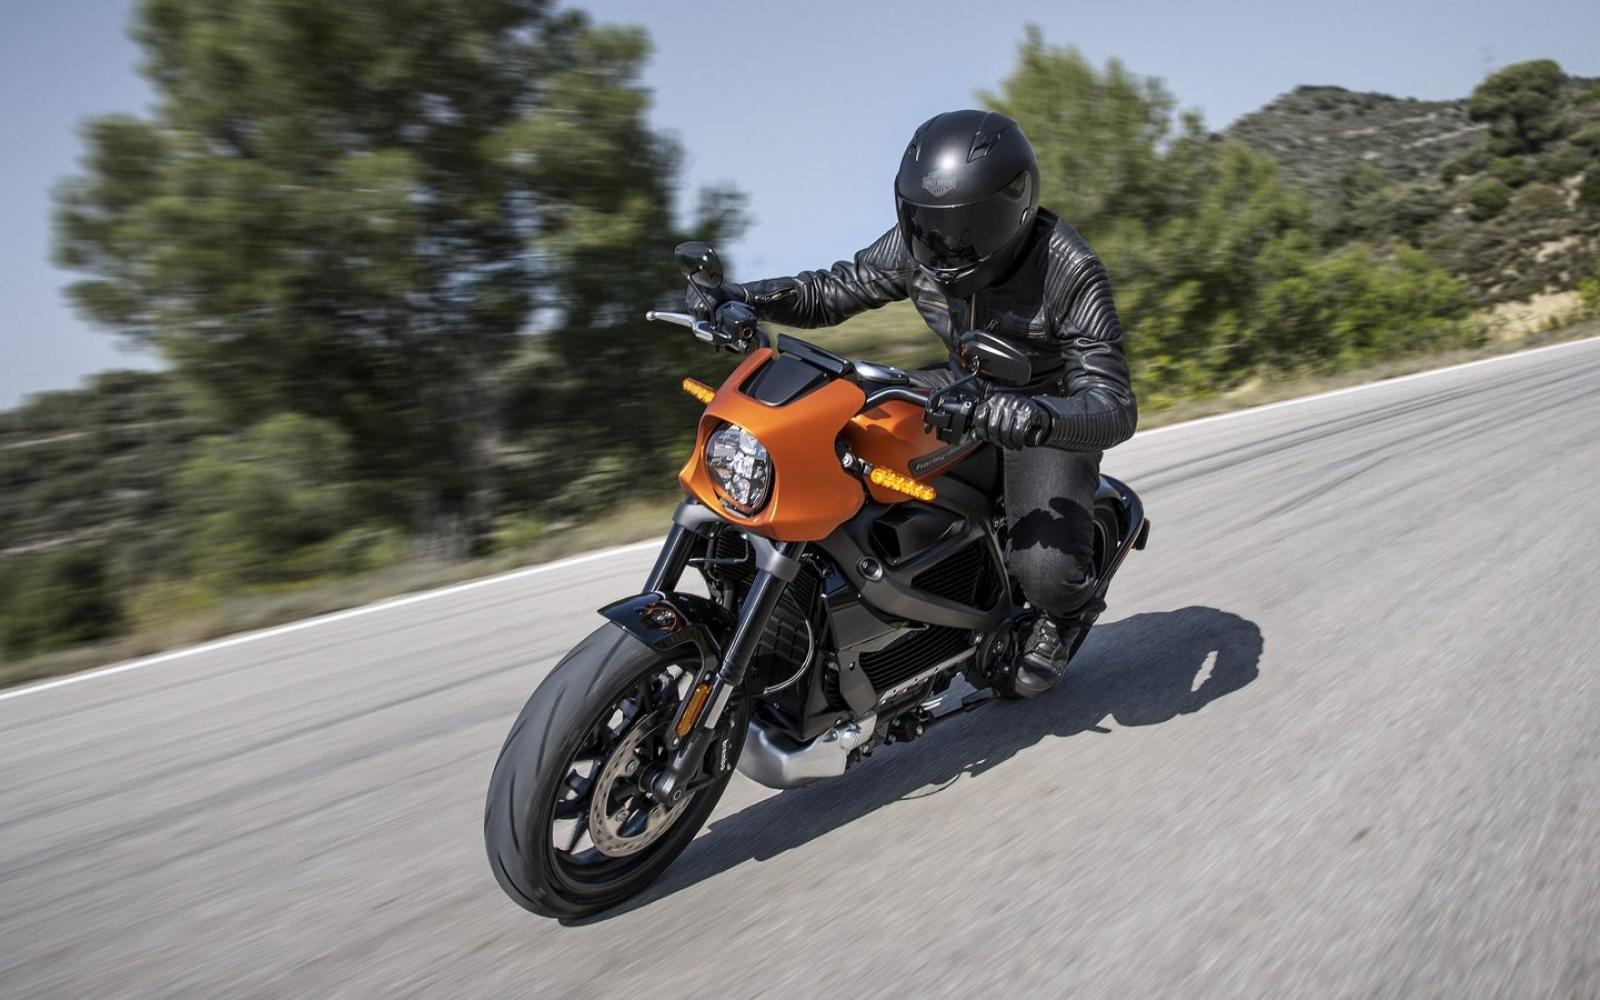 Zwitser rijdt 1723 kilometer in 24 uur op elektrische Harley-Davidson